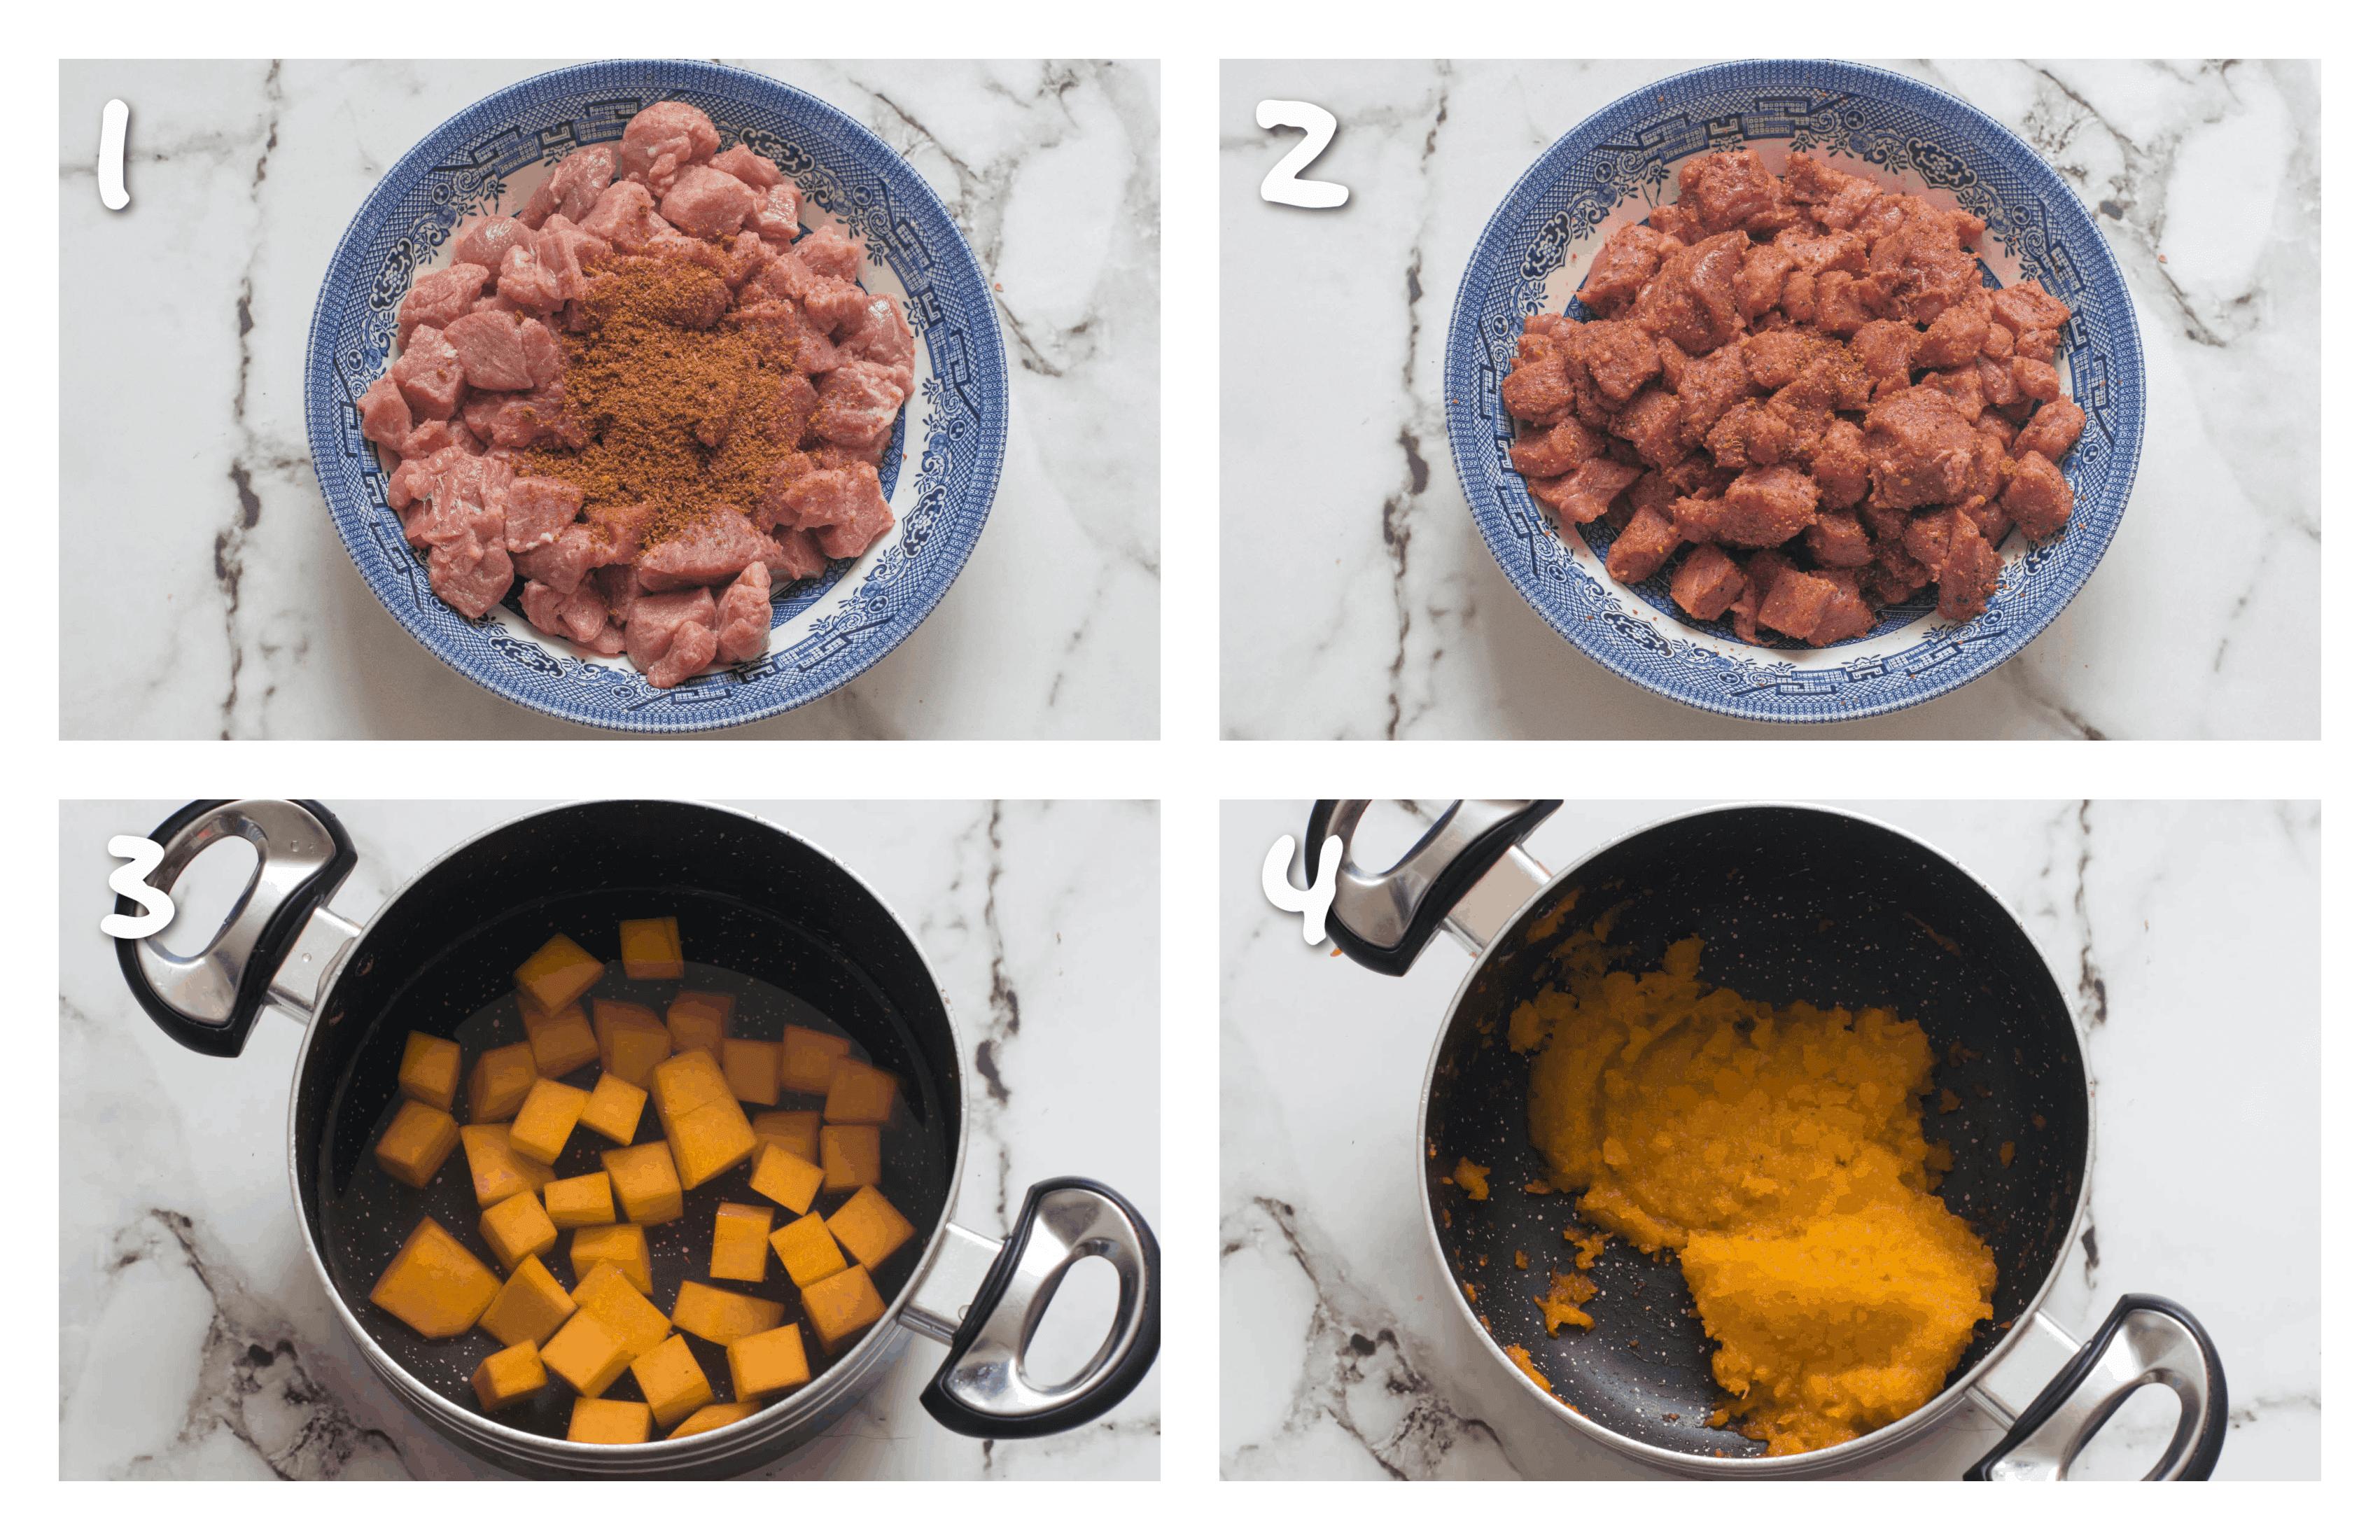 steps1-4 seasoning beef and boiling_mashing pumpkin